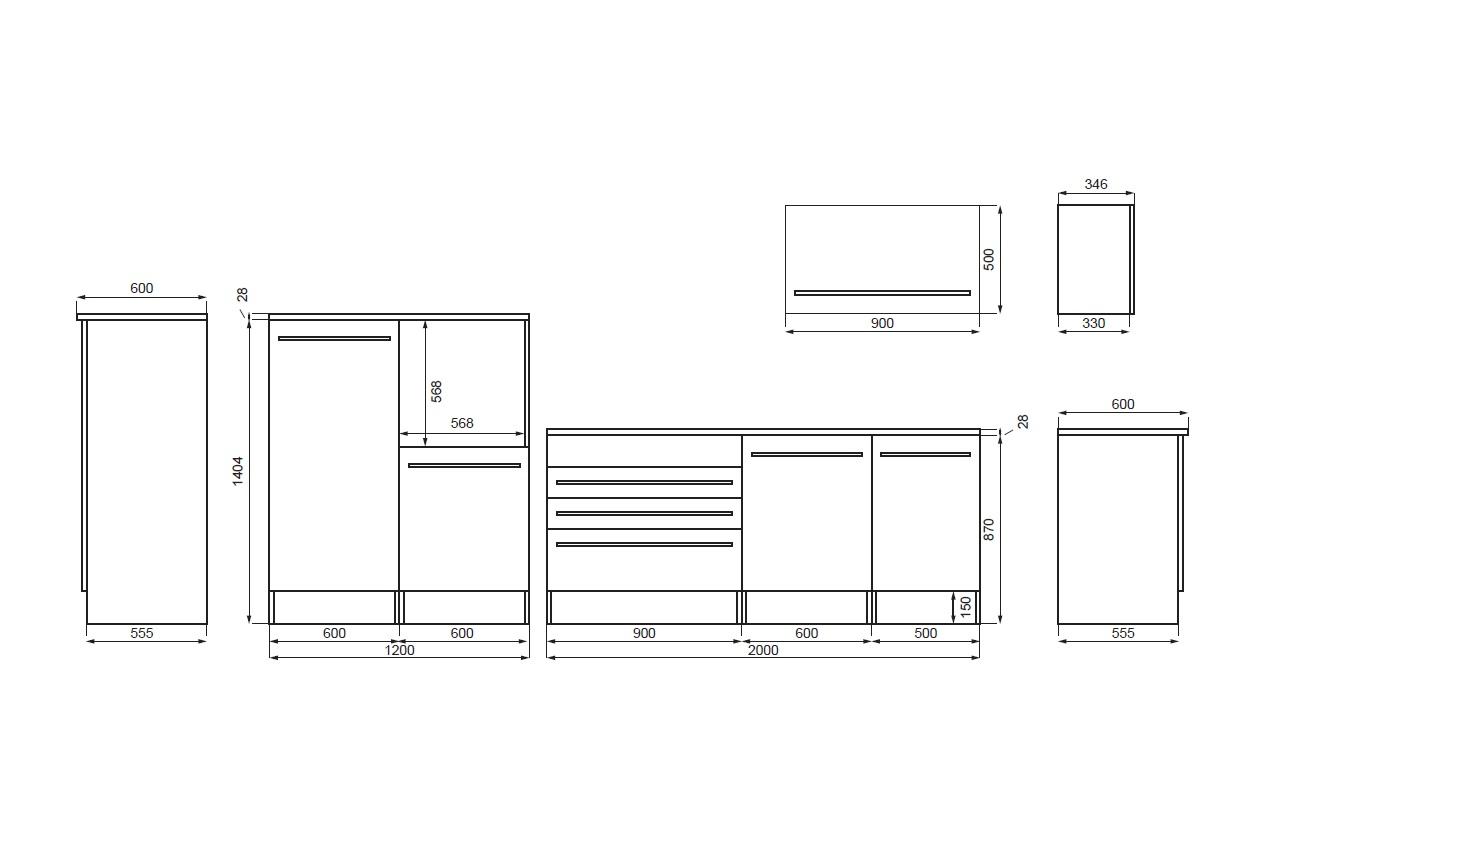 k che k chenzeile k chenblock einbauk che komplettk che wei 320 cm respekta ebay. Black Bedroom Furniture Sets. Home Design Ideas